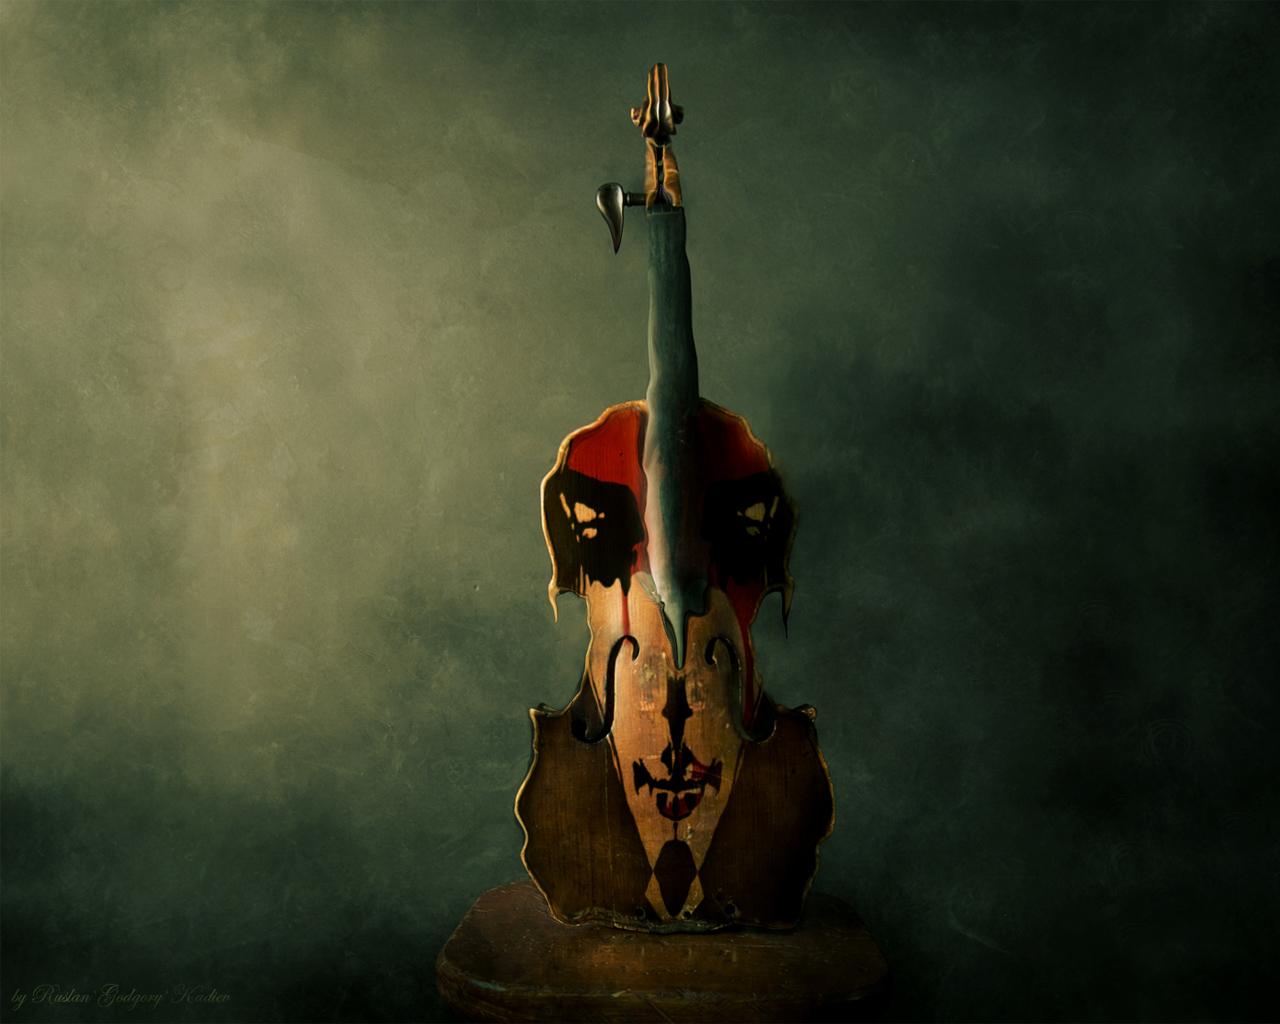 Violin Wallpaper: Download Free Wallpaper